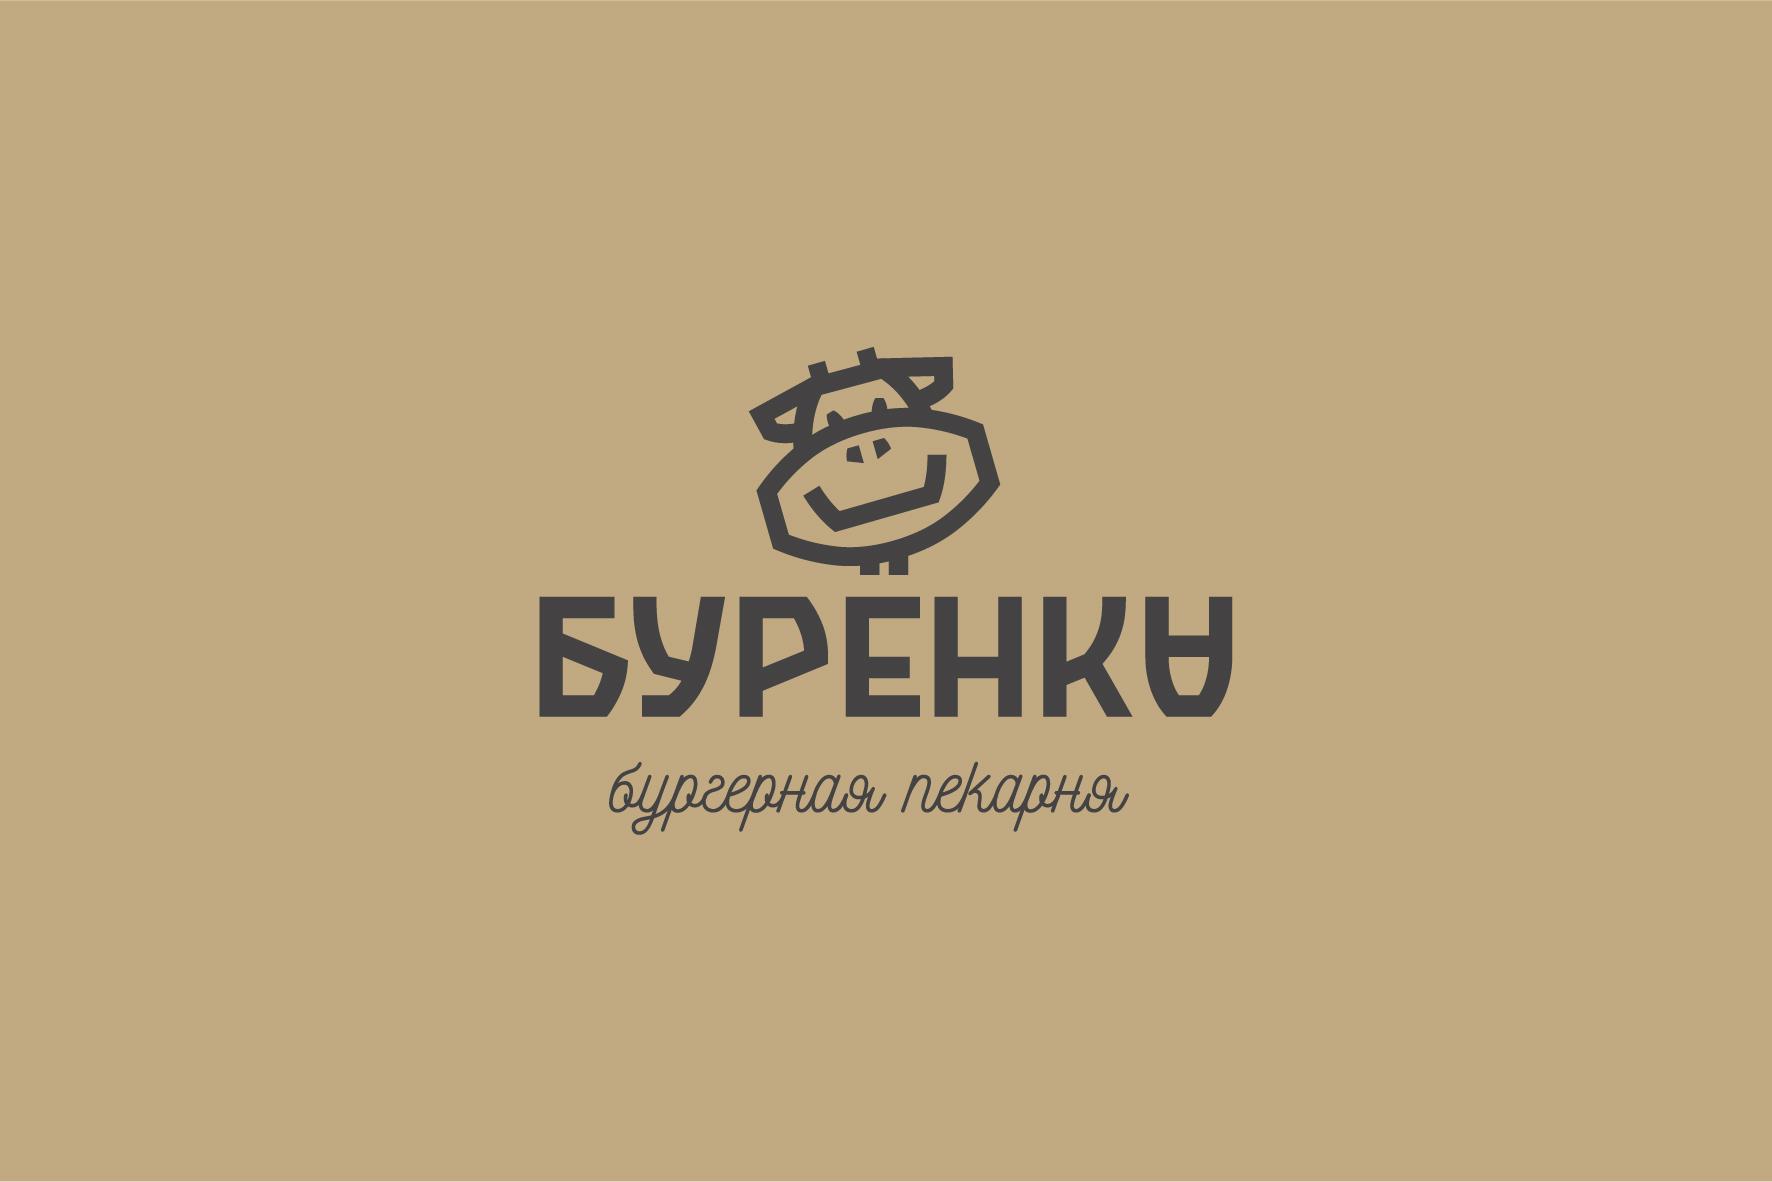 Логотип для Бургерной с Пекарней фото f_0975e151e7d14b86.jpg